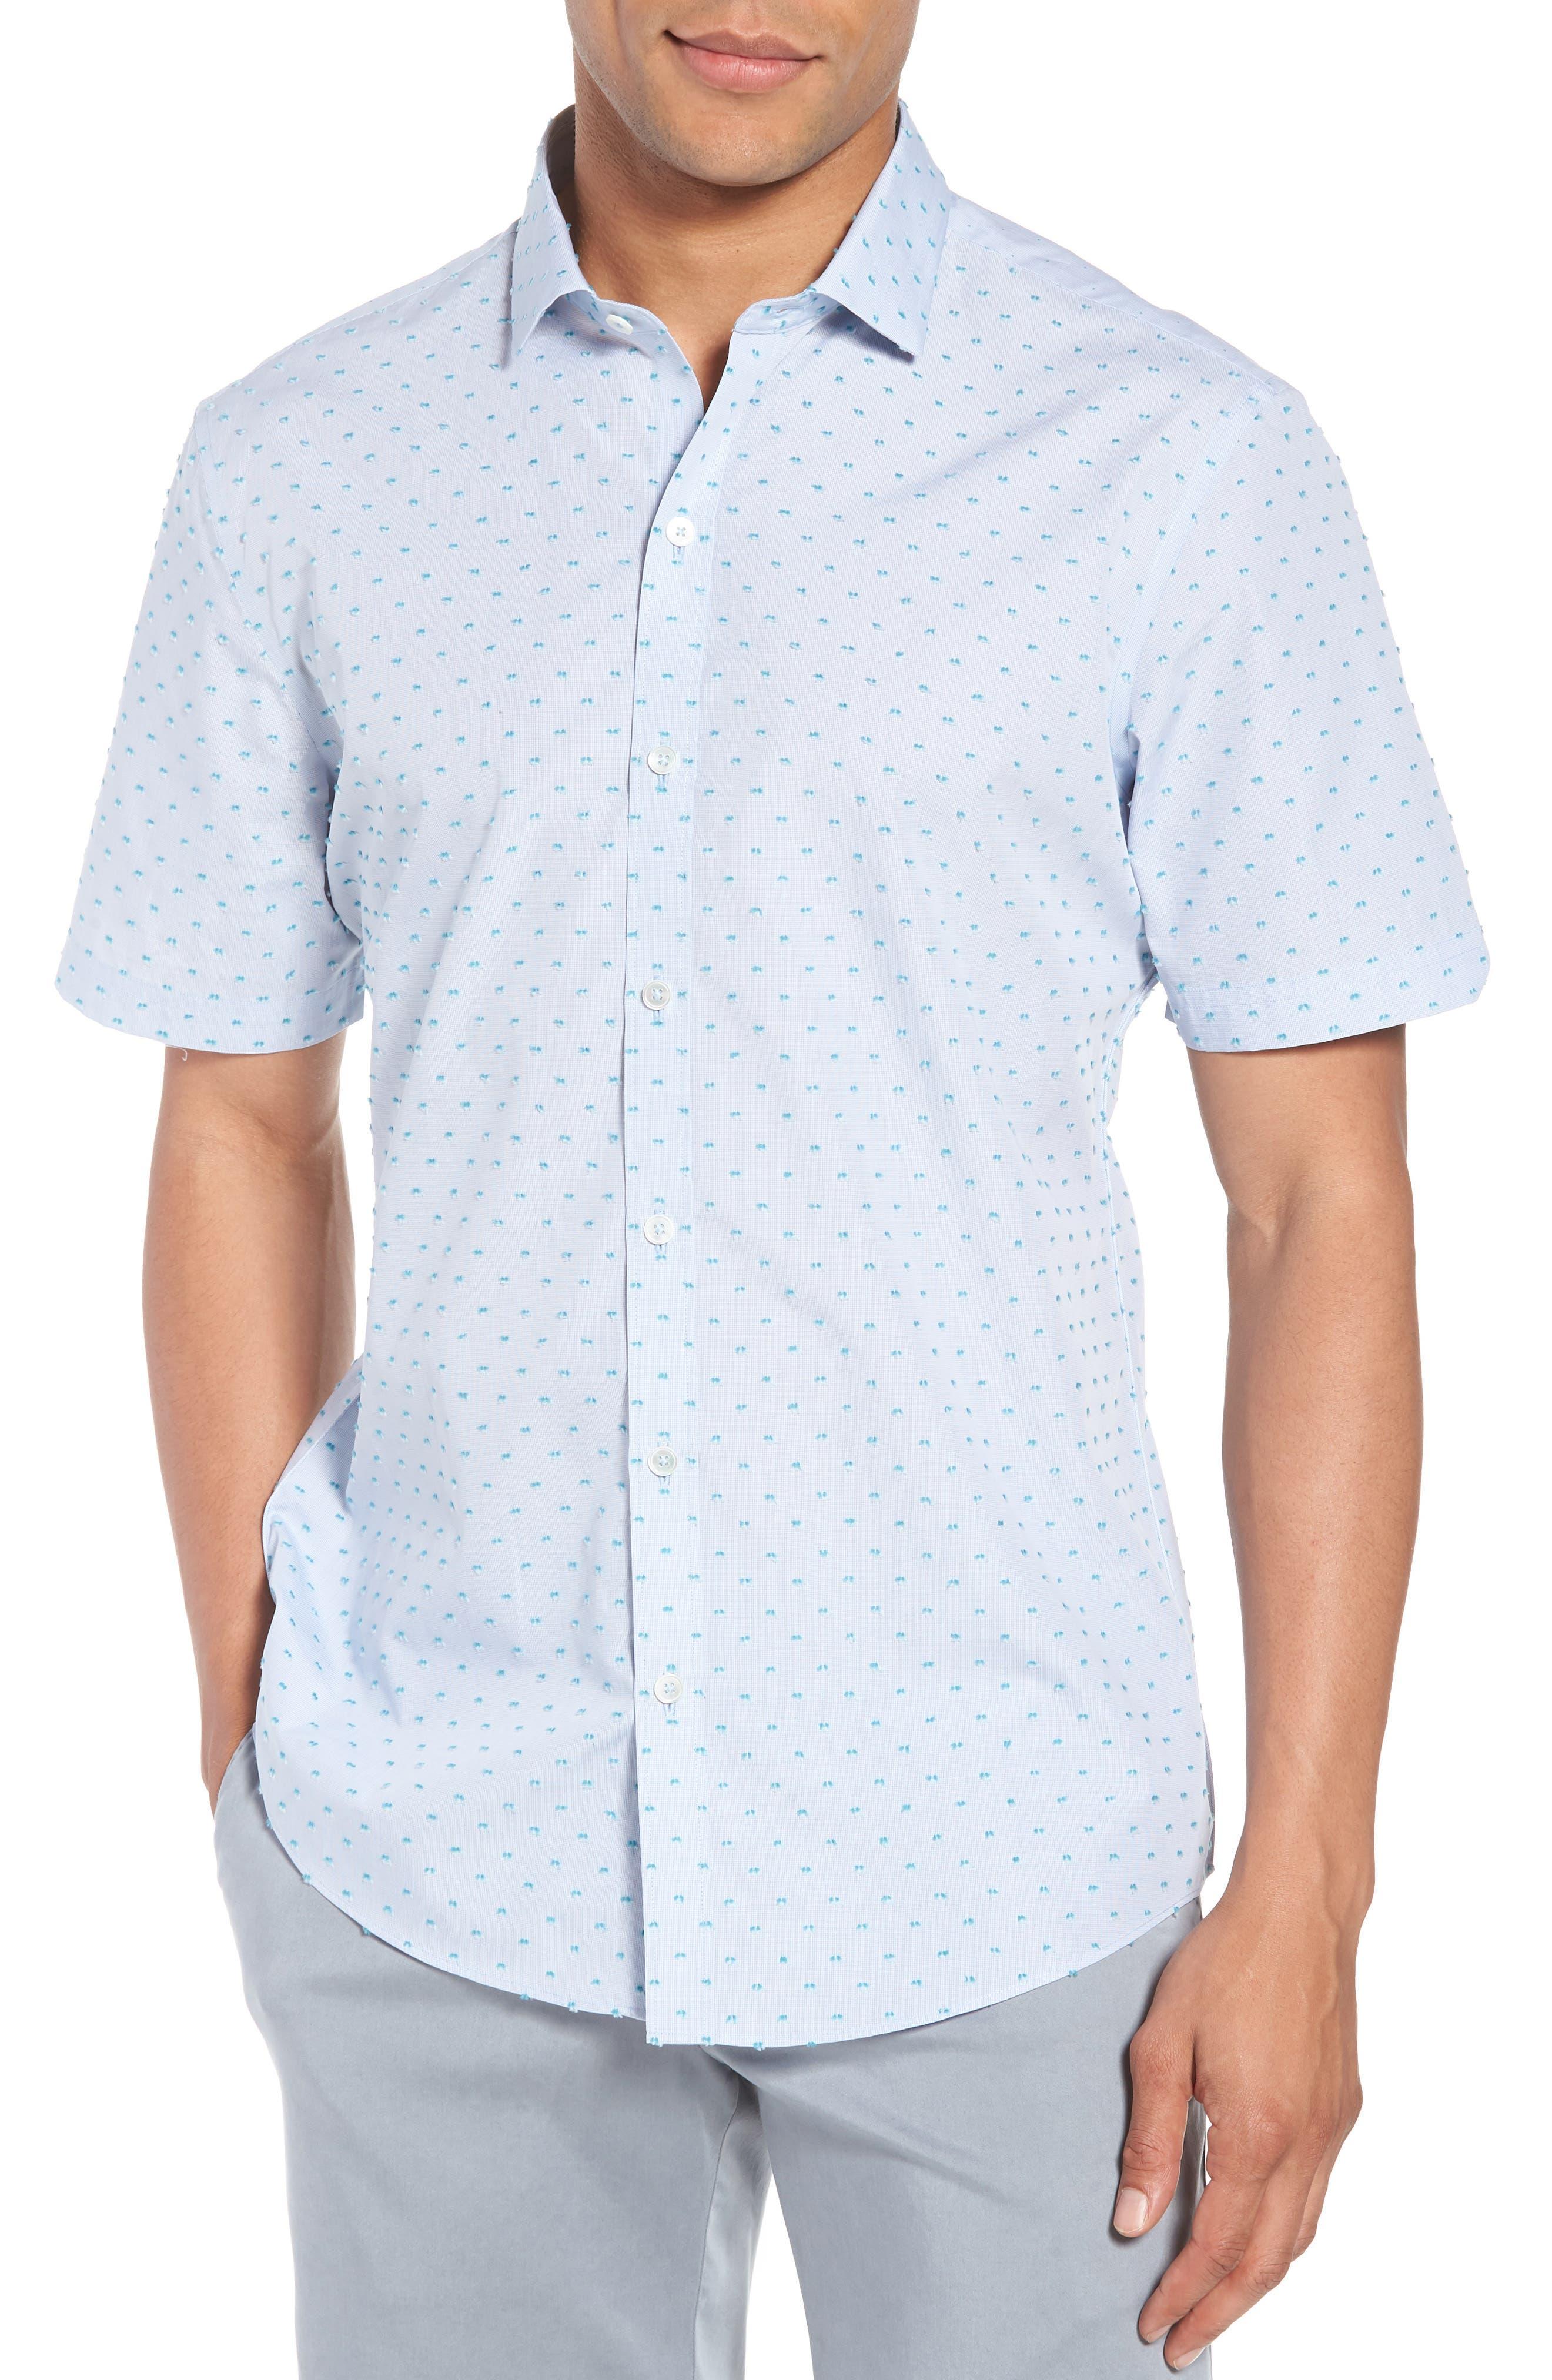 Dolle Fil a Coupe Sport Shirt,                             Main thumbnail 1, color,                             450